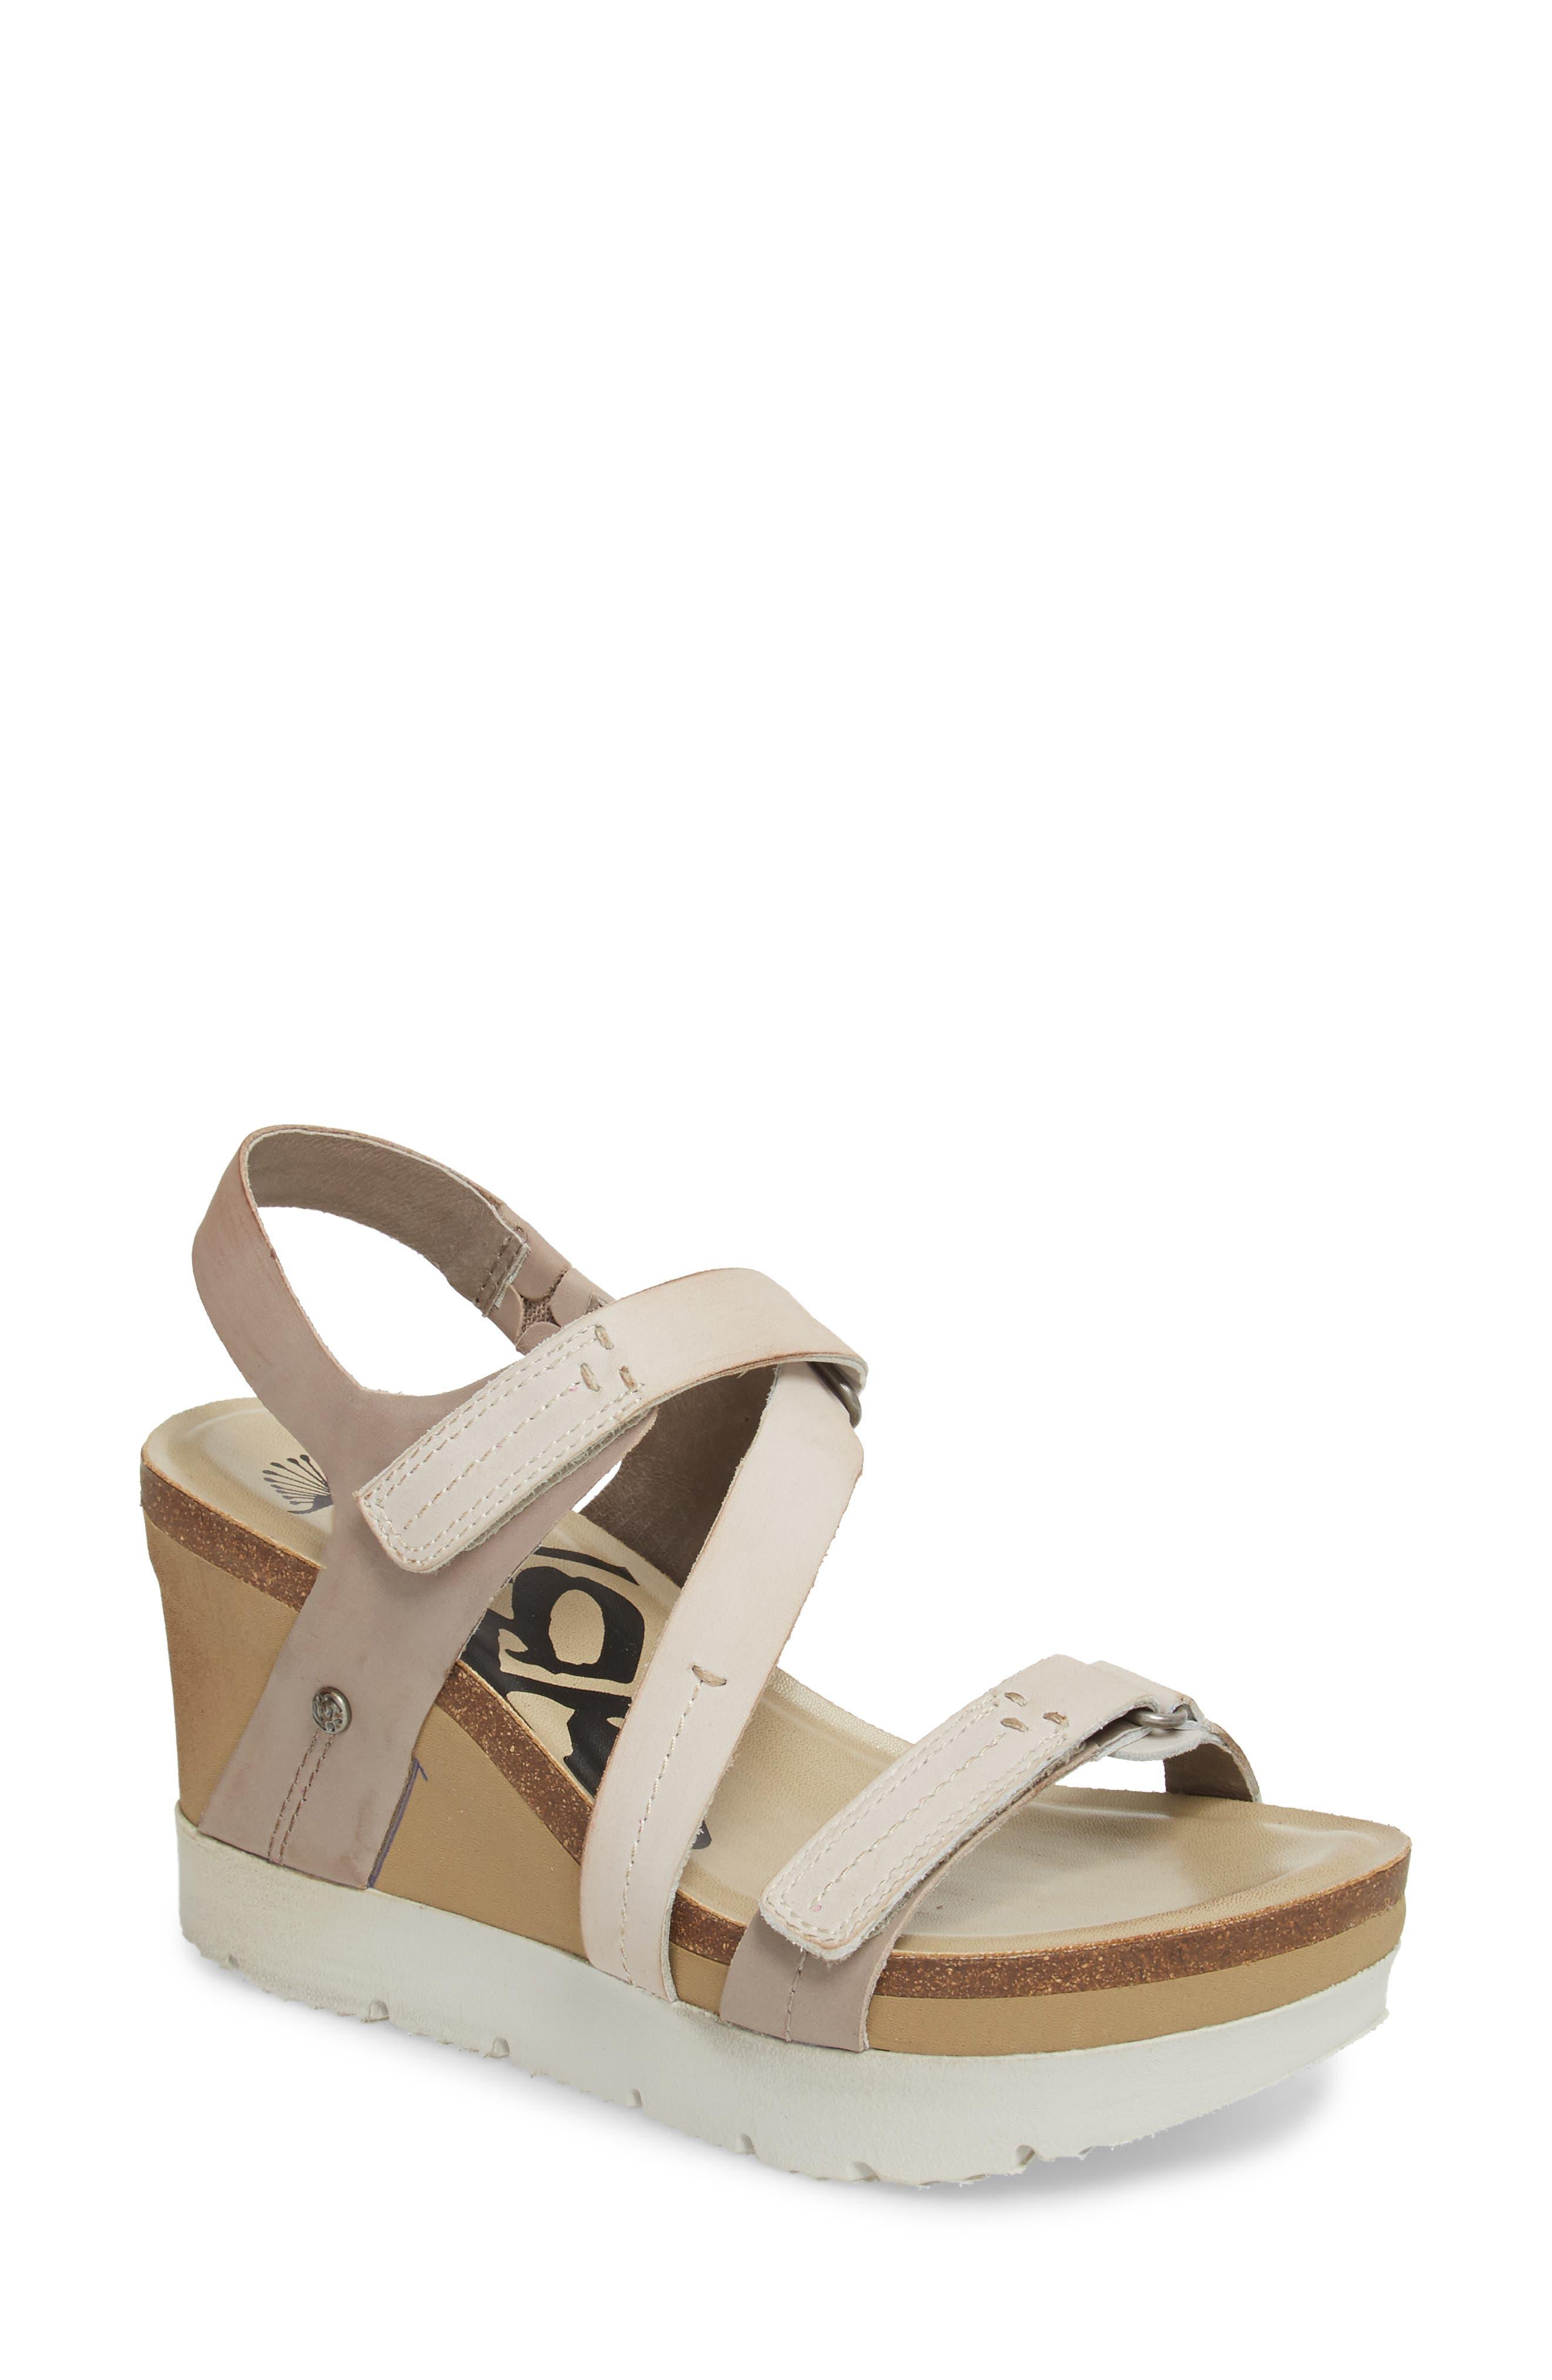 Women s Otbt Wavey Wedge Sandal E5129